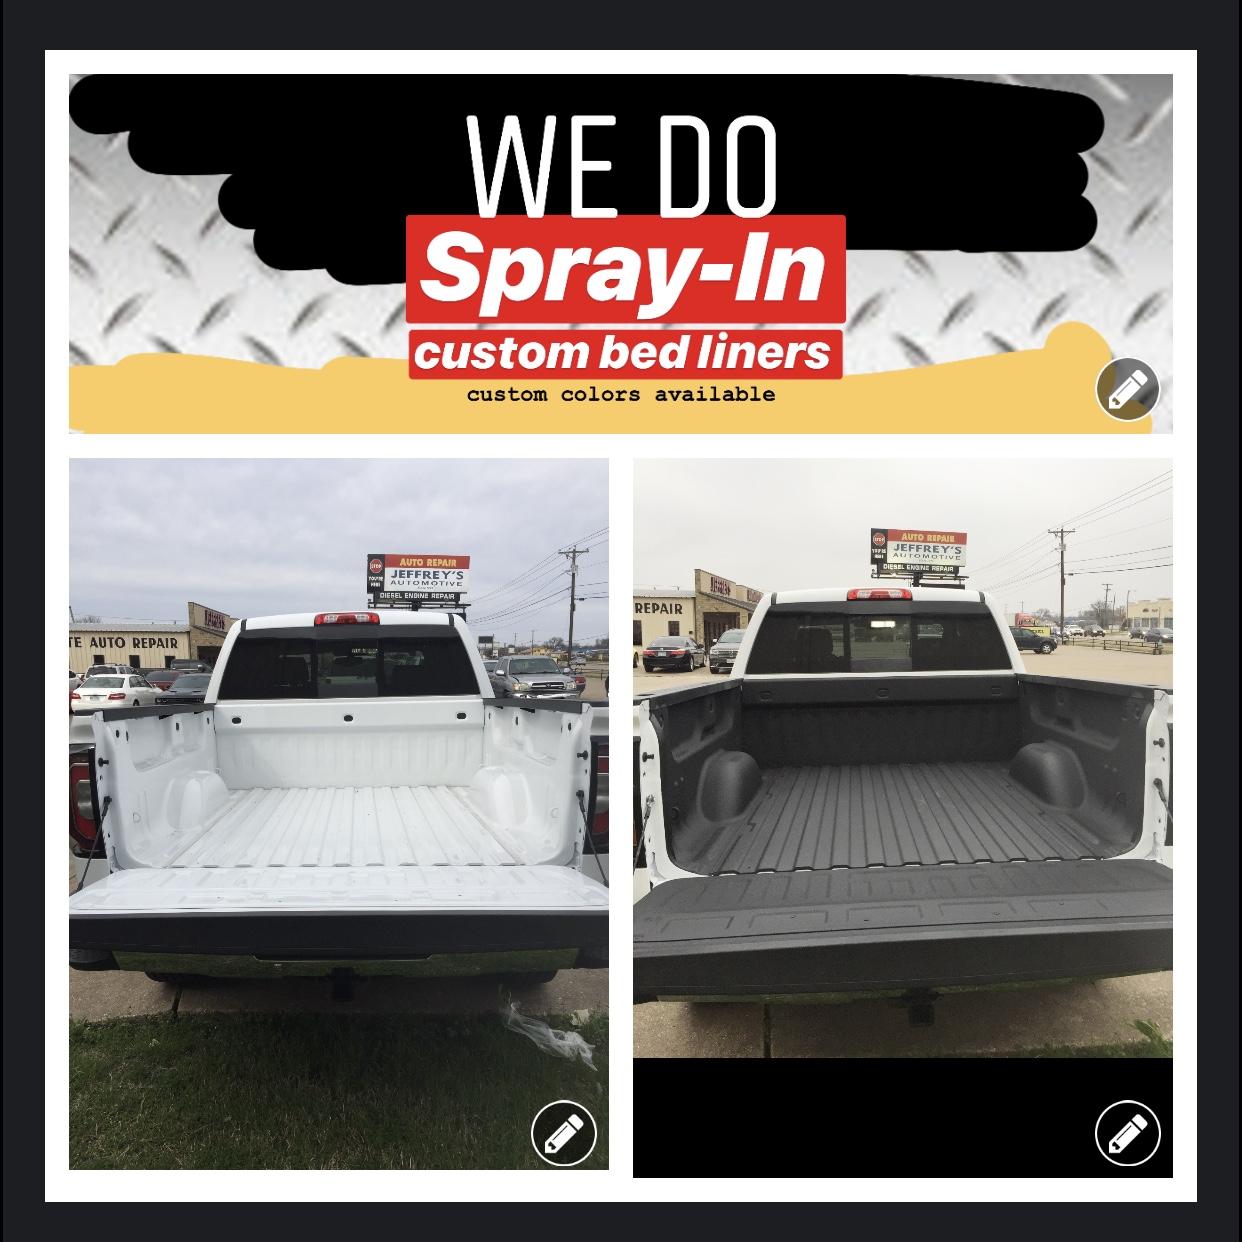 Jeffrey's Sprayed-in Custom Bed Liners